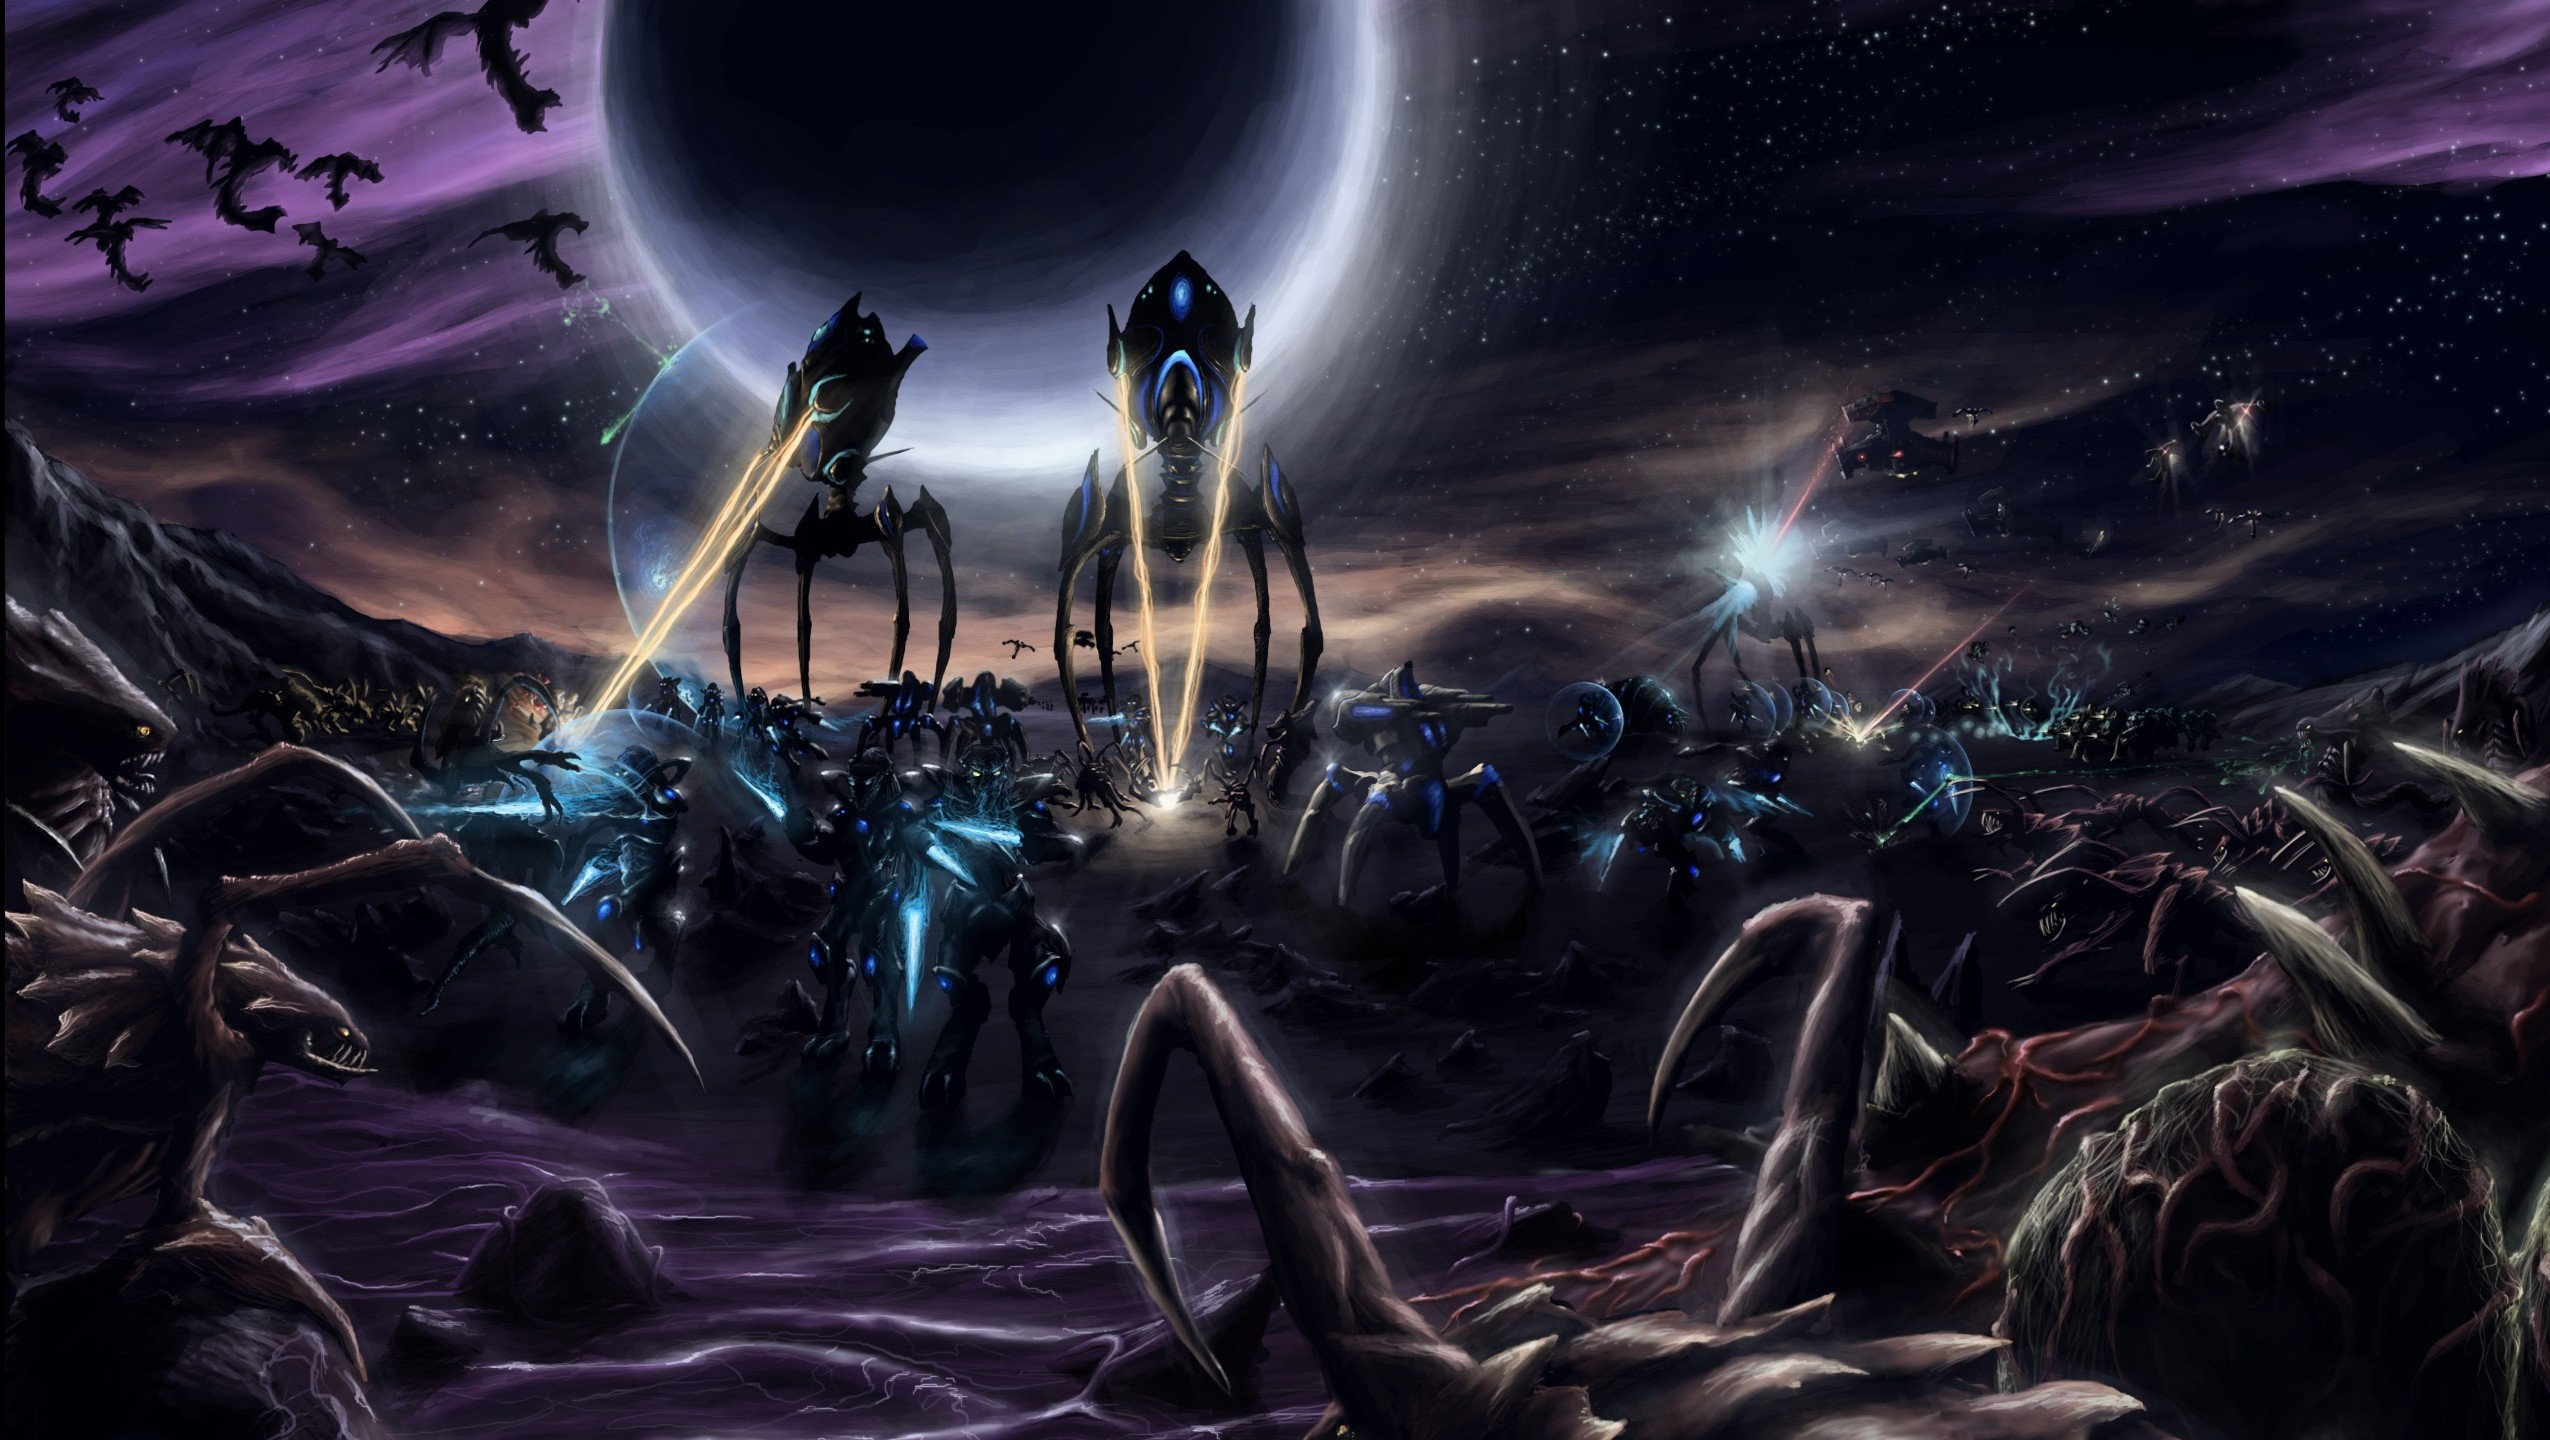 Video Games Wallpaper 2550x1440 Video Games StarCraft Zerg 2550x1440